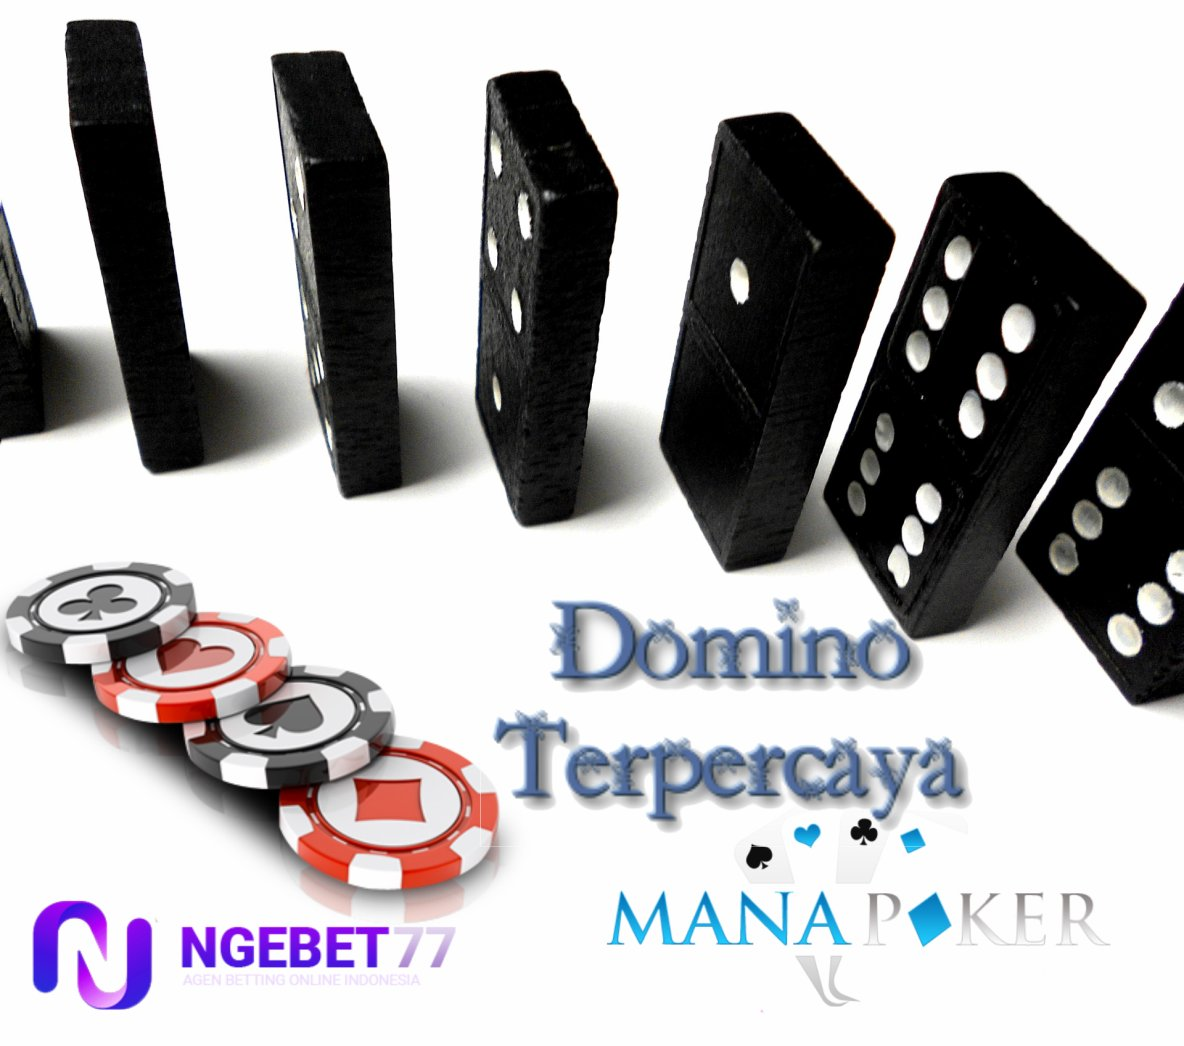 Situs Poker Domino Online Terpercaya | Ngebet77.news